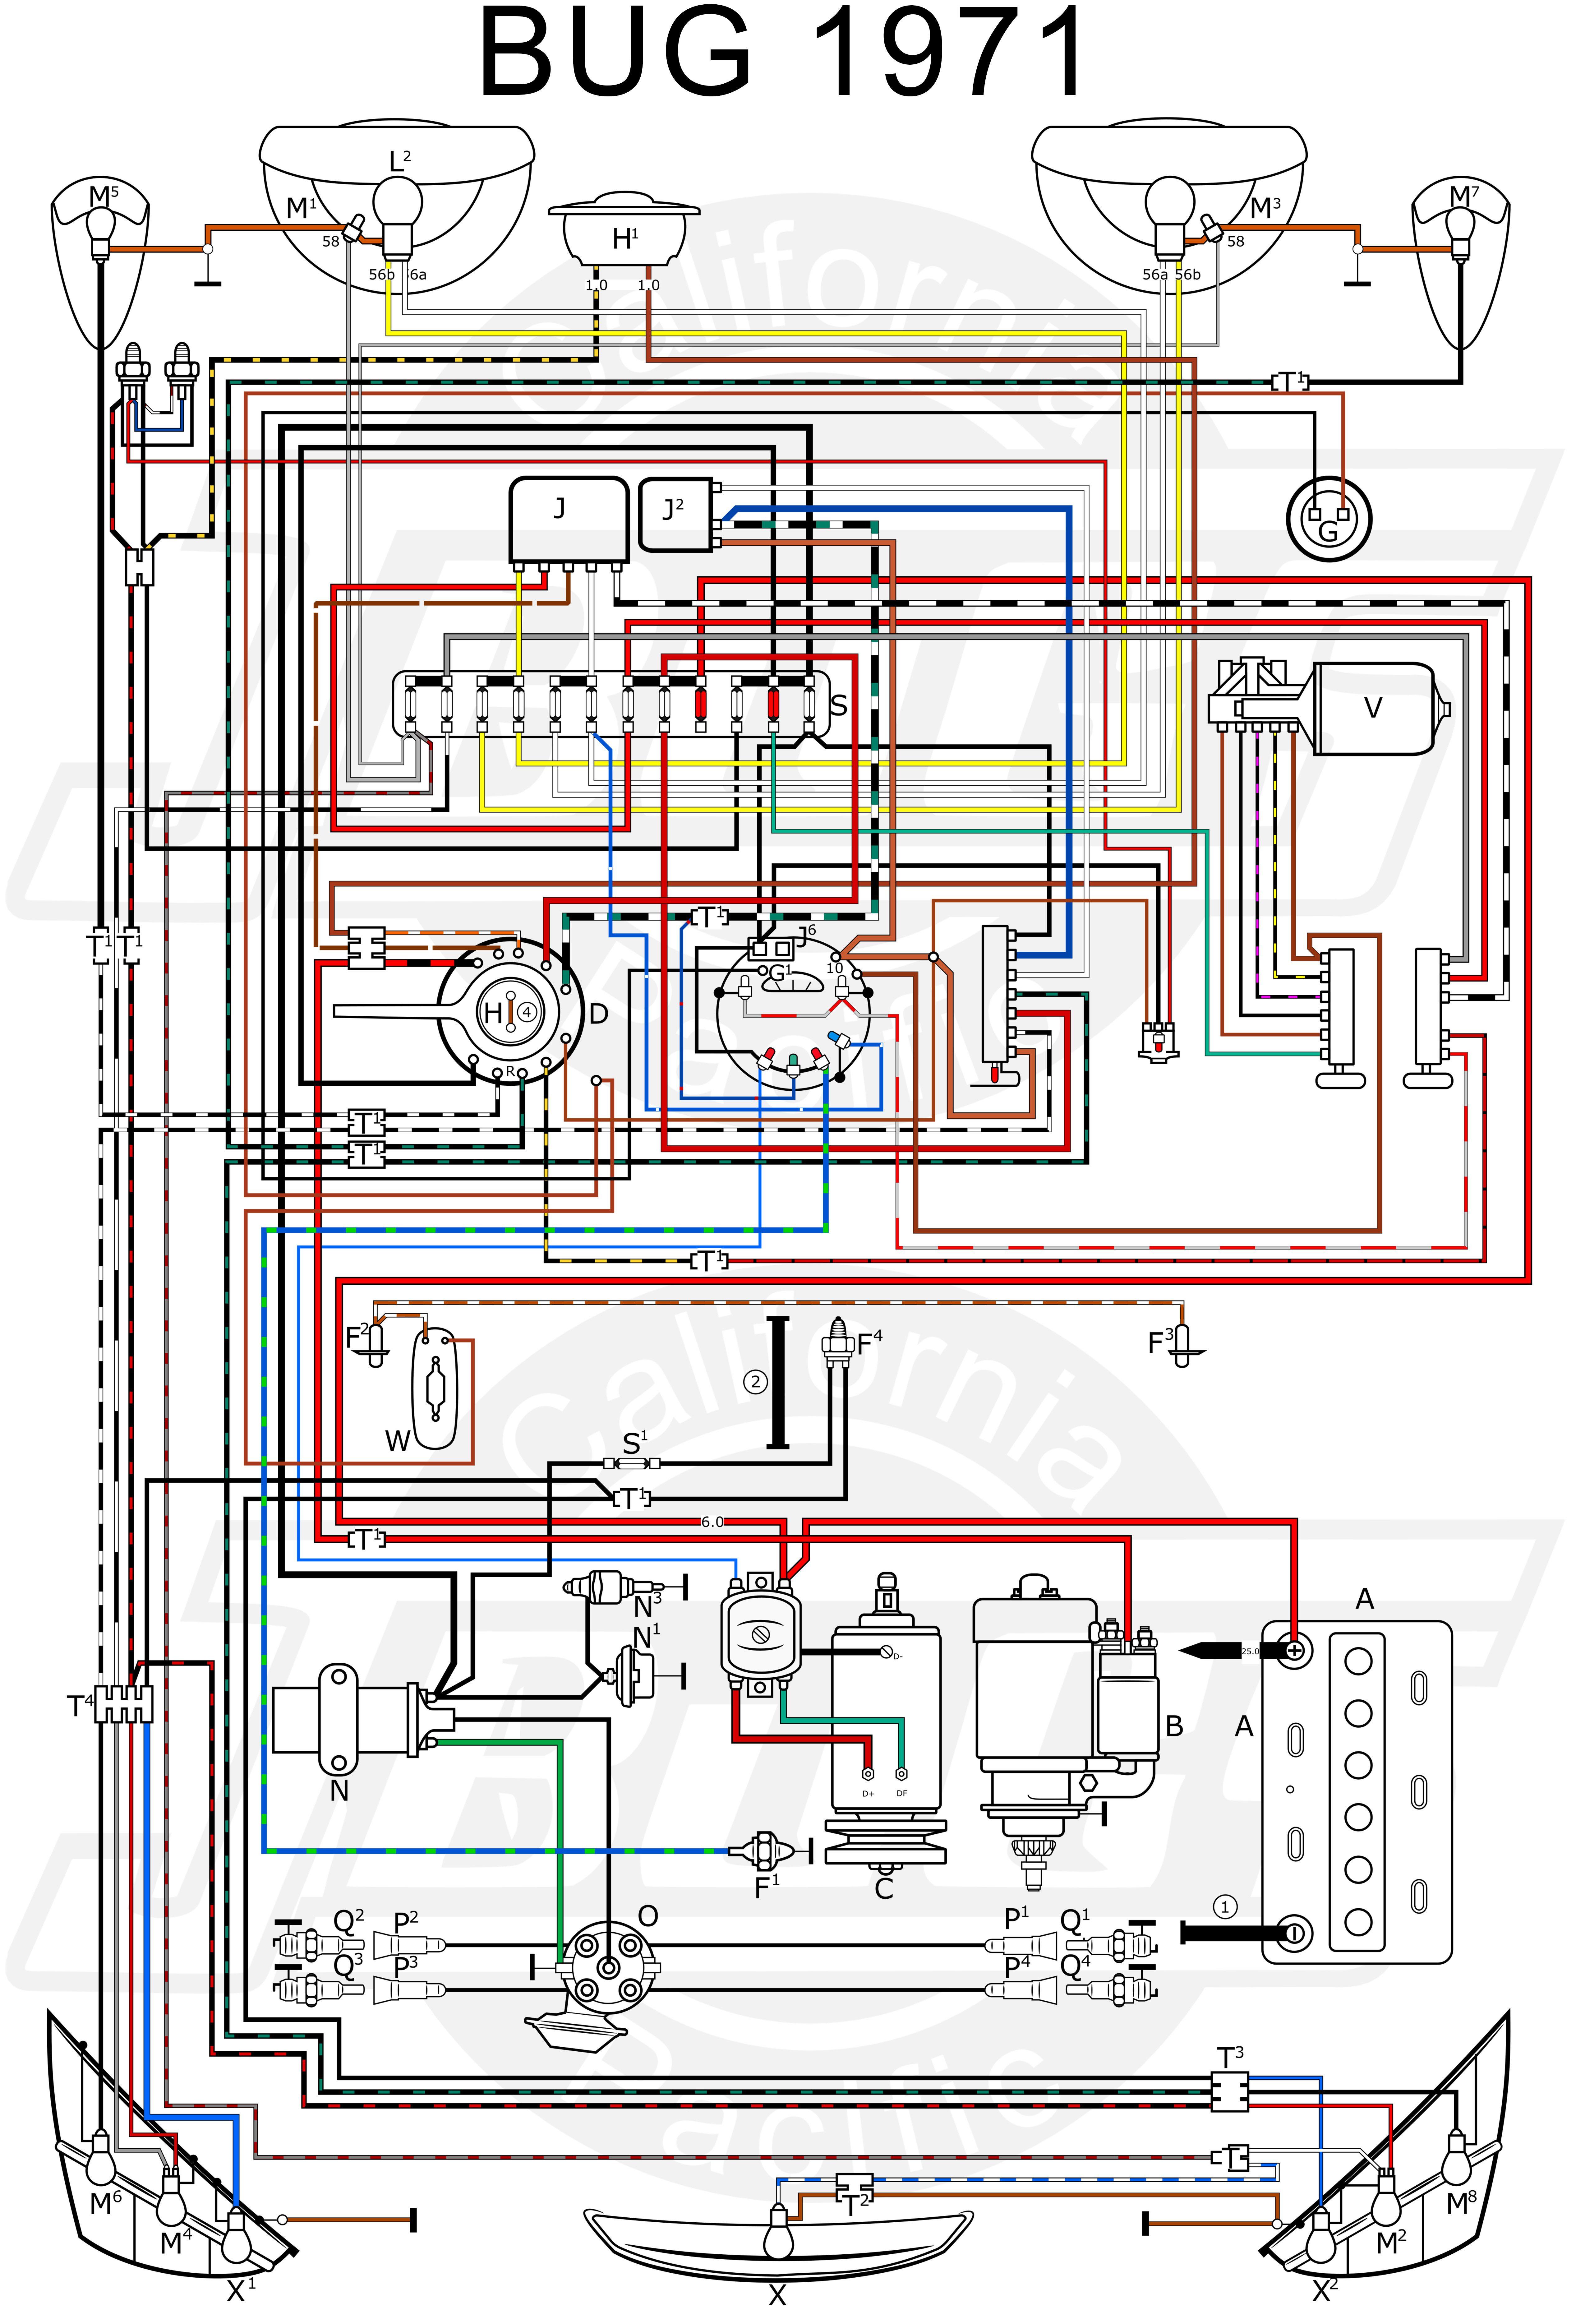 Custom Autosound Wiring Diagram Bookingritzcarlton Info Vw Beetles Diagram Electrical Wiring Diagram